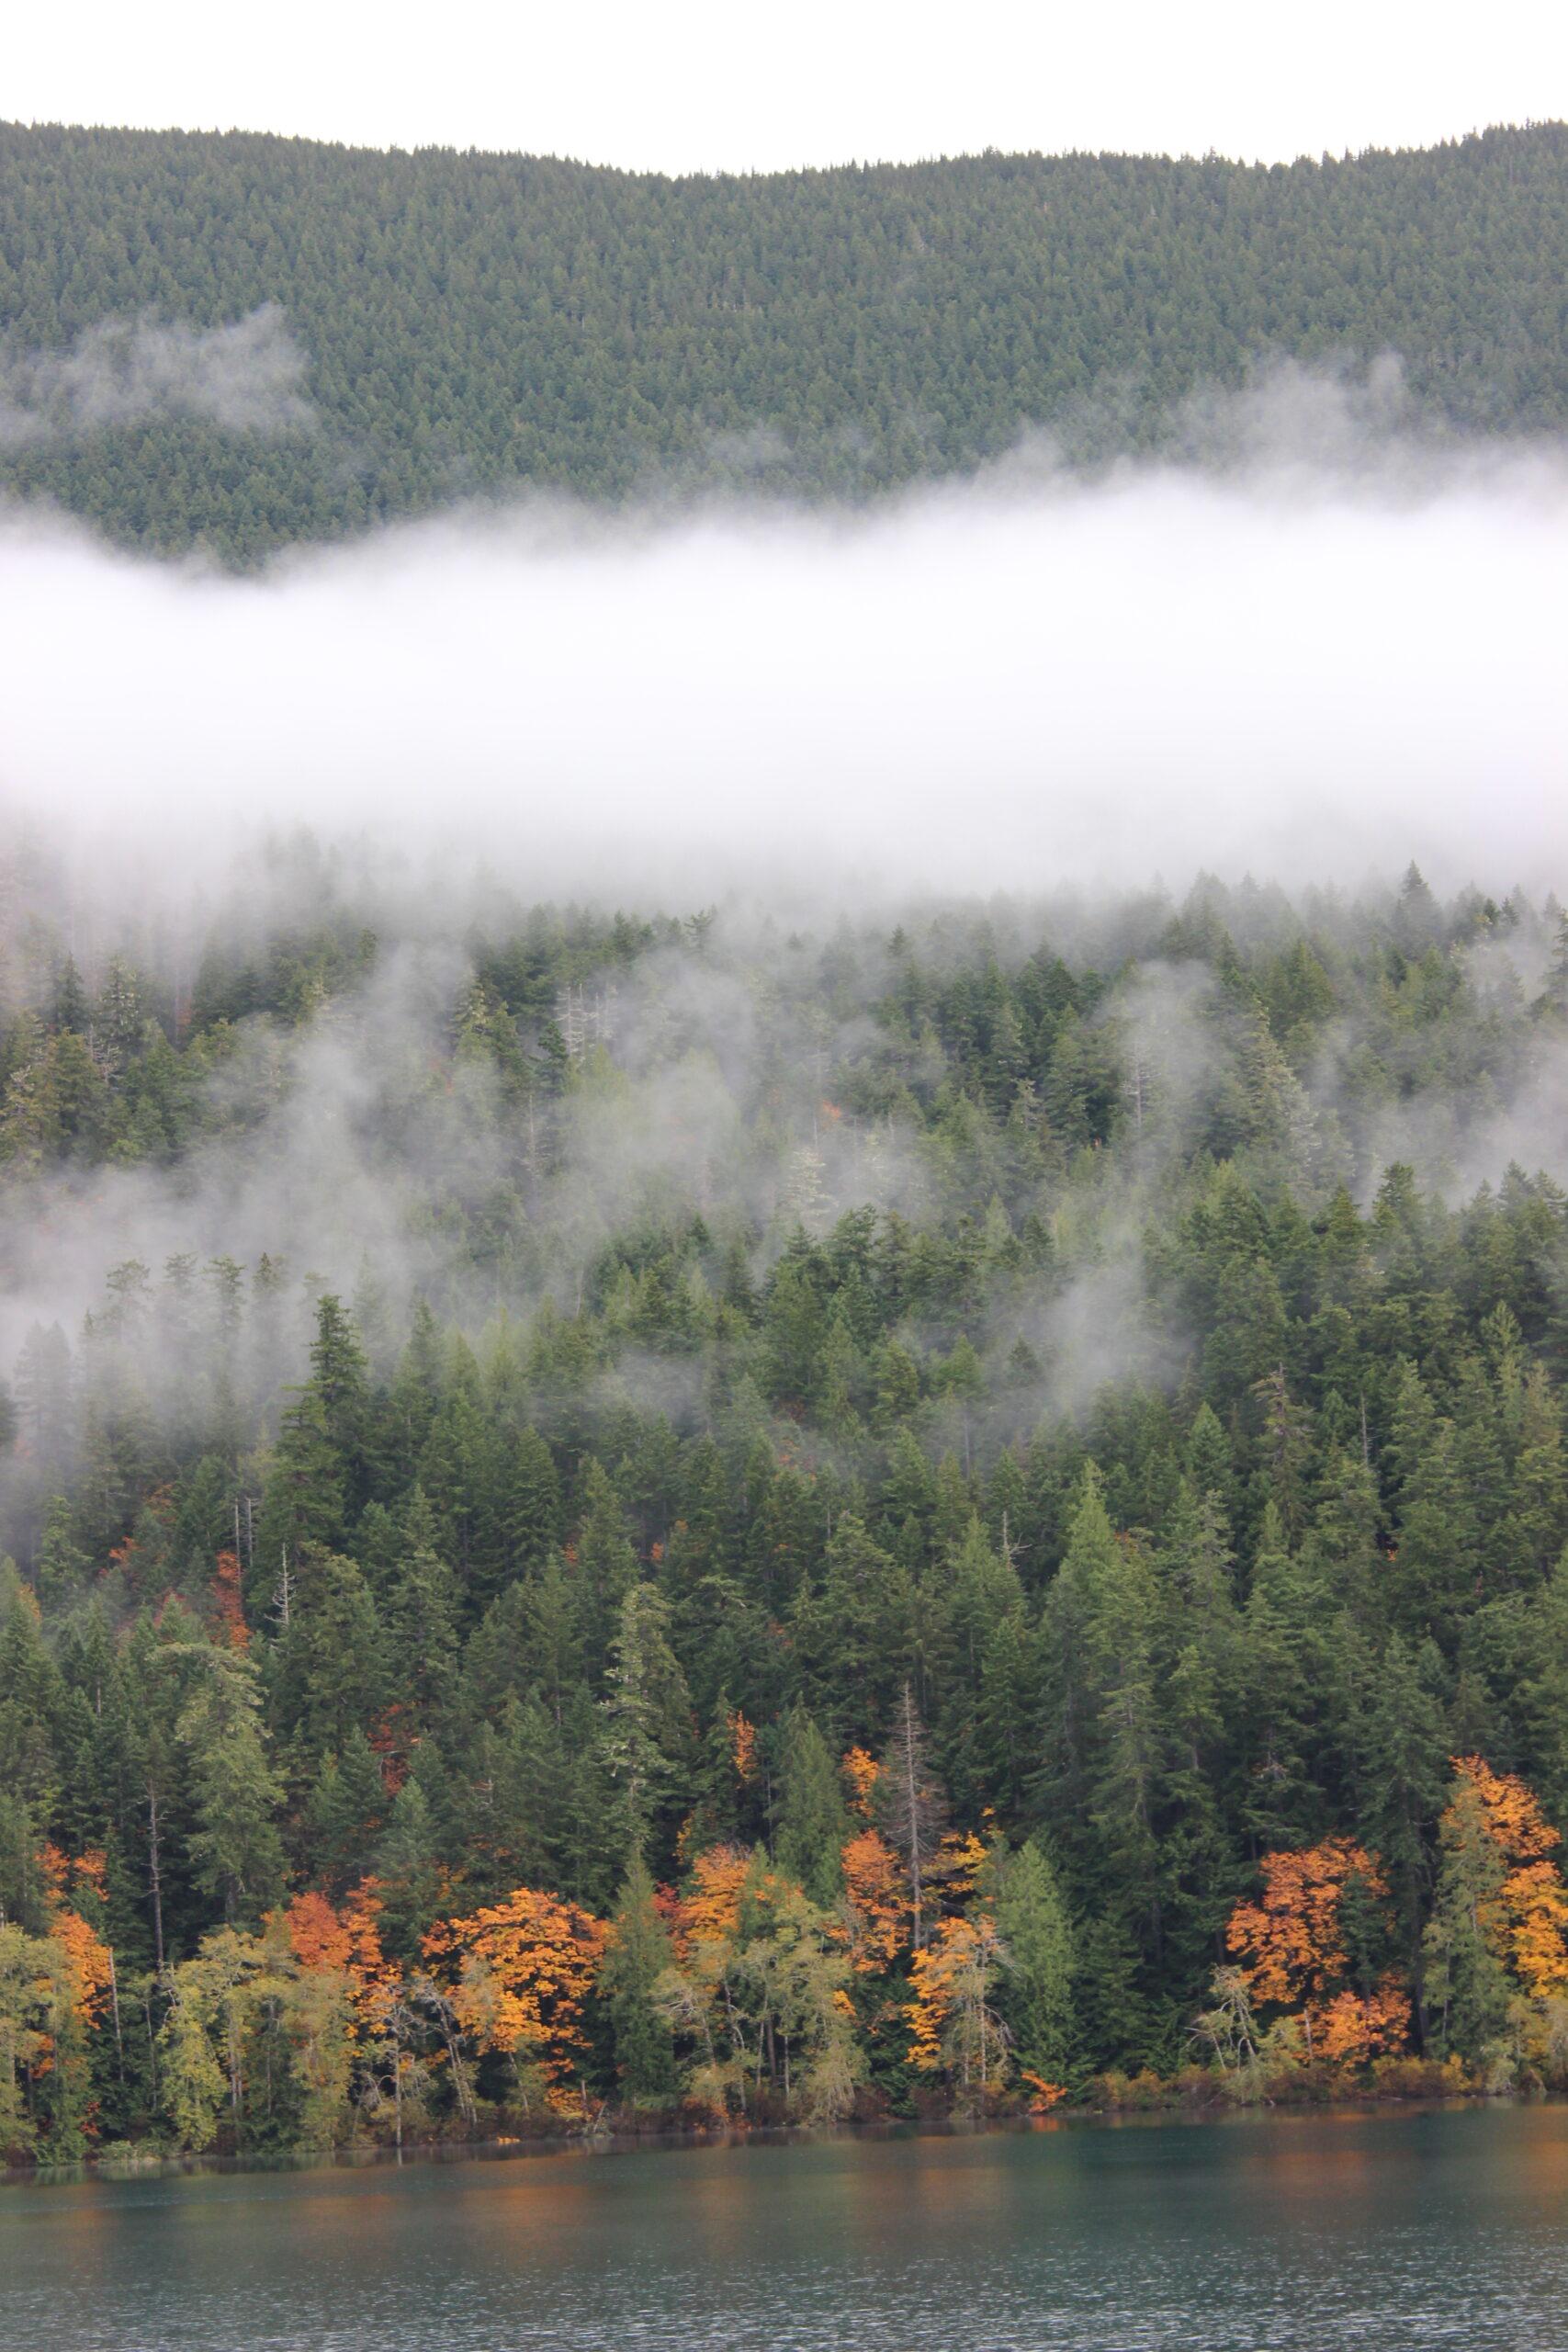 Fog shrouded fall trees near seattle.